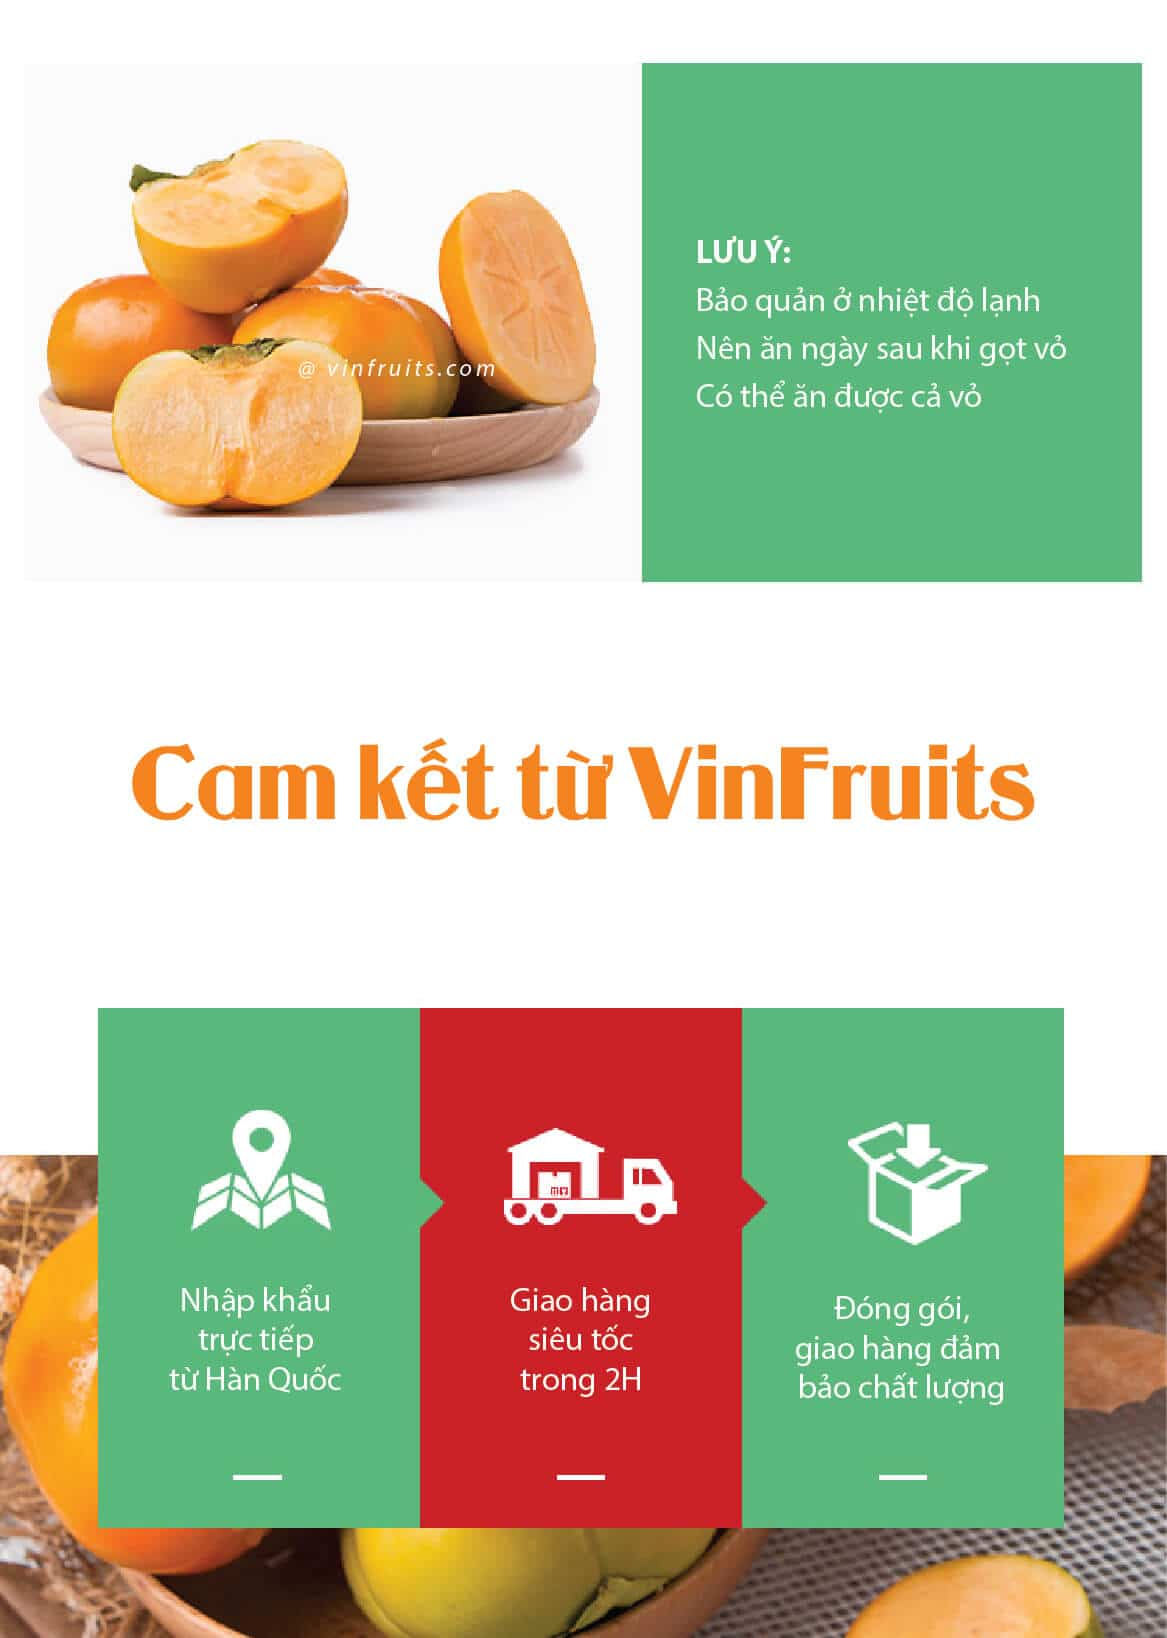 Hong gion Han Quoc - vinfruits 6